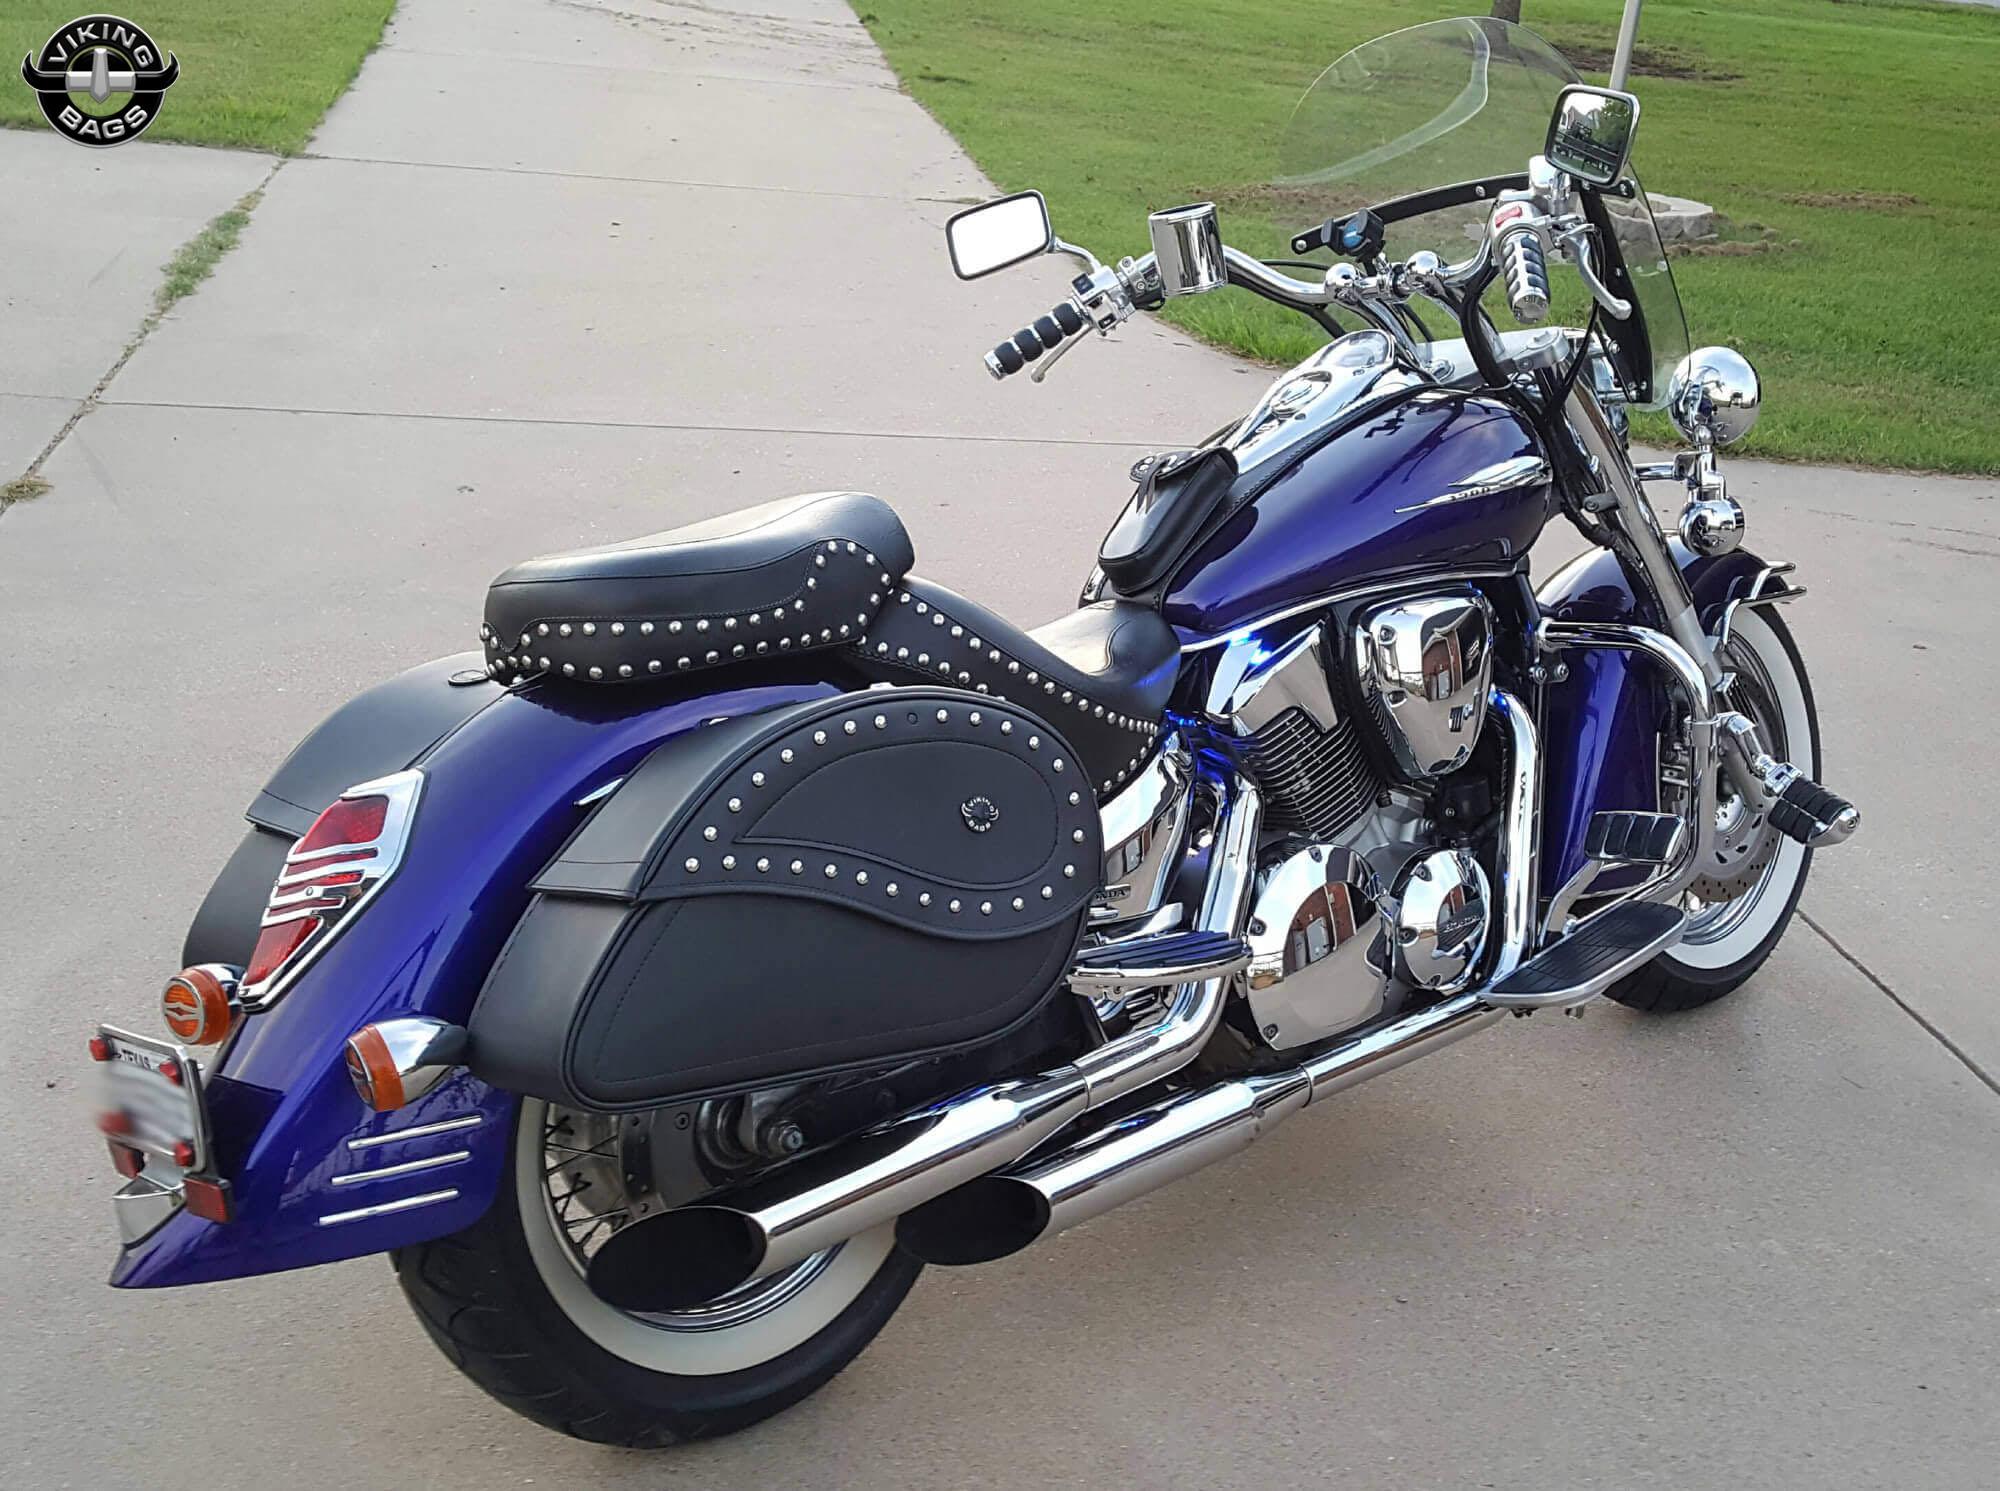 medium resolution of  michael s 03 honda vtx 1300 w ultimate shape studded saddlebags